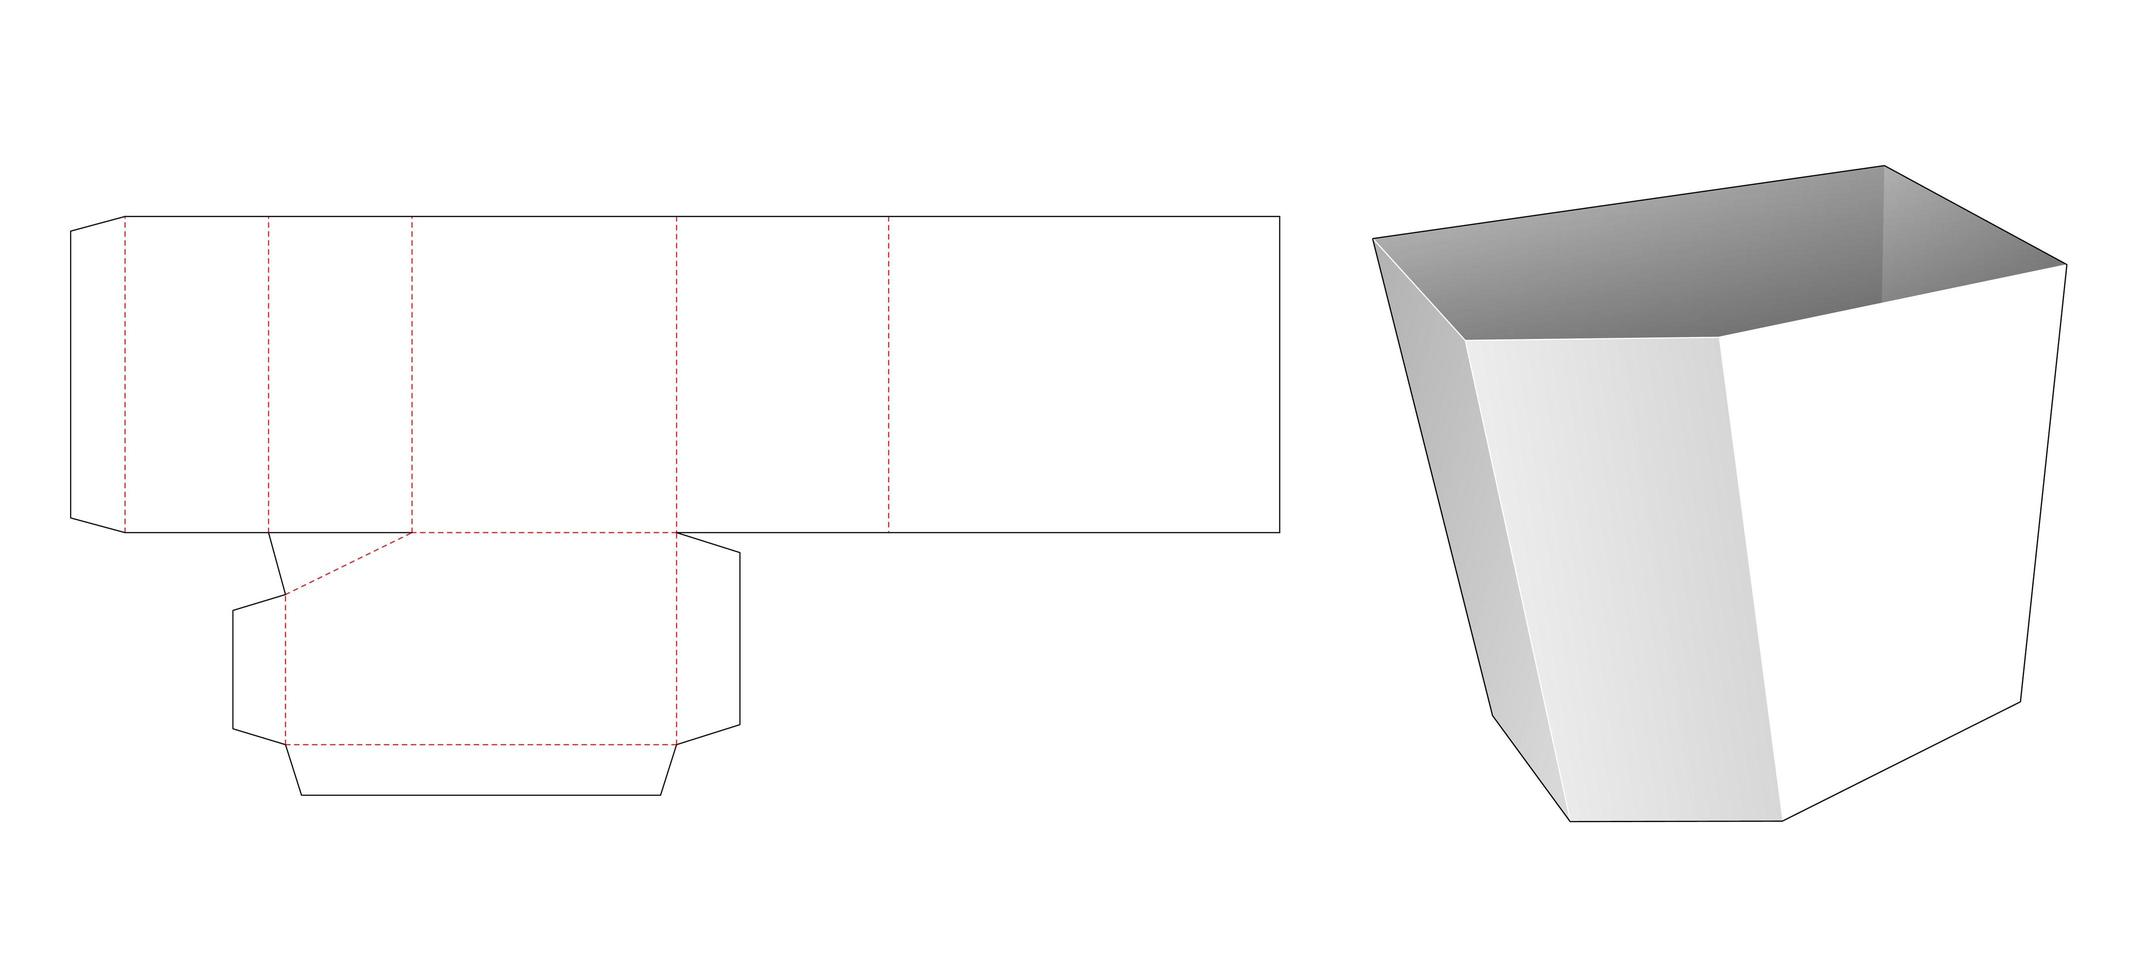 molde de corte e vinco para caixa de papelaria chanfrada vetor